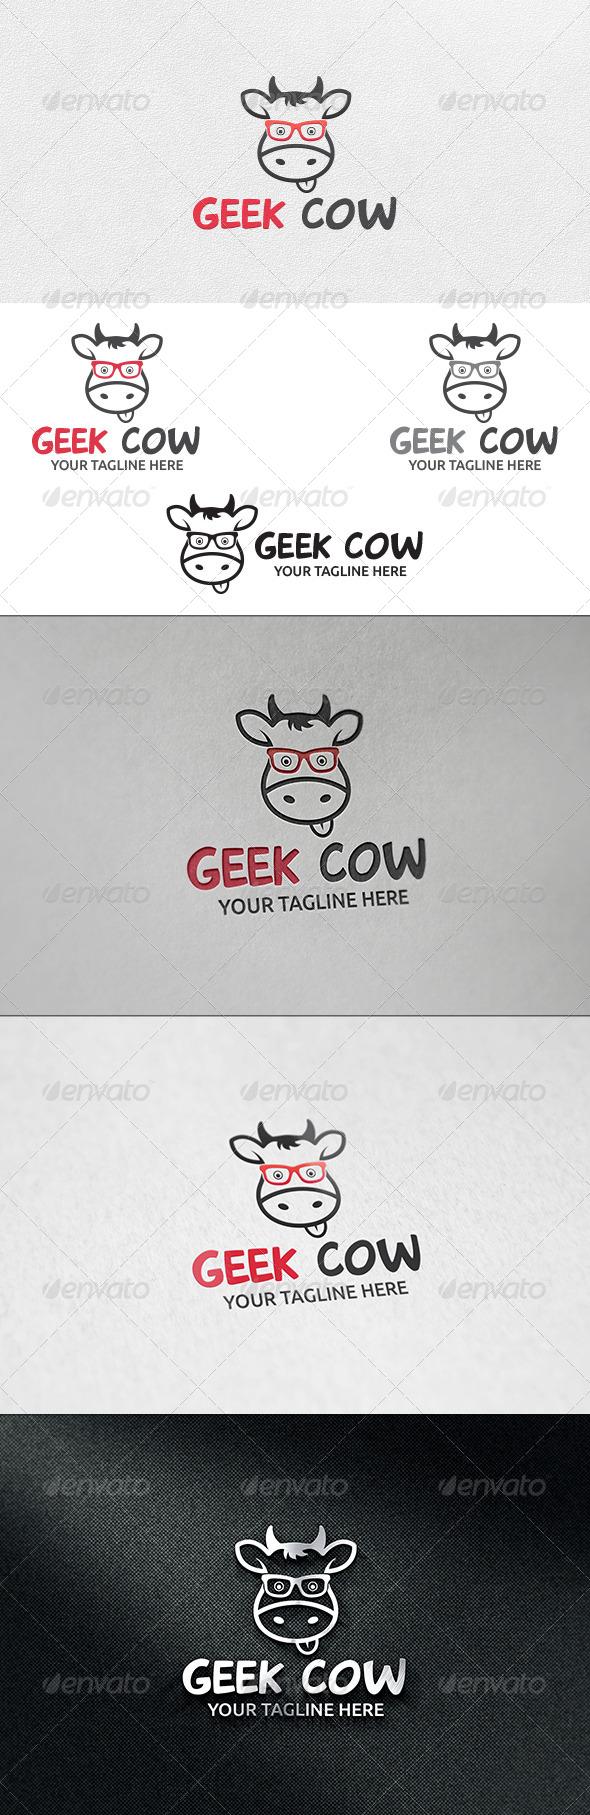 Geek Cow - Logo Template - Animals Logo Templates